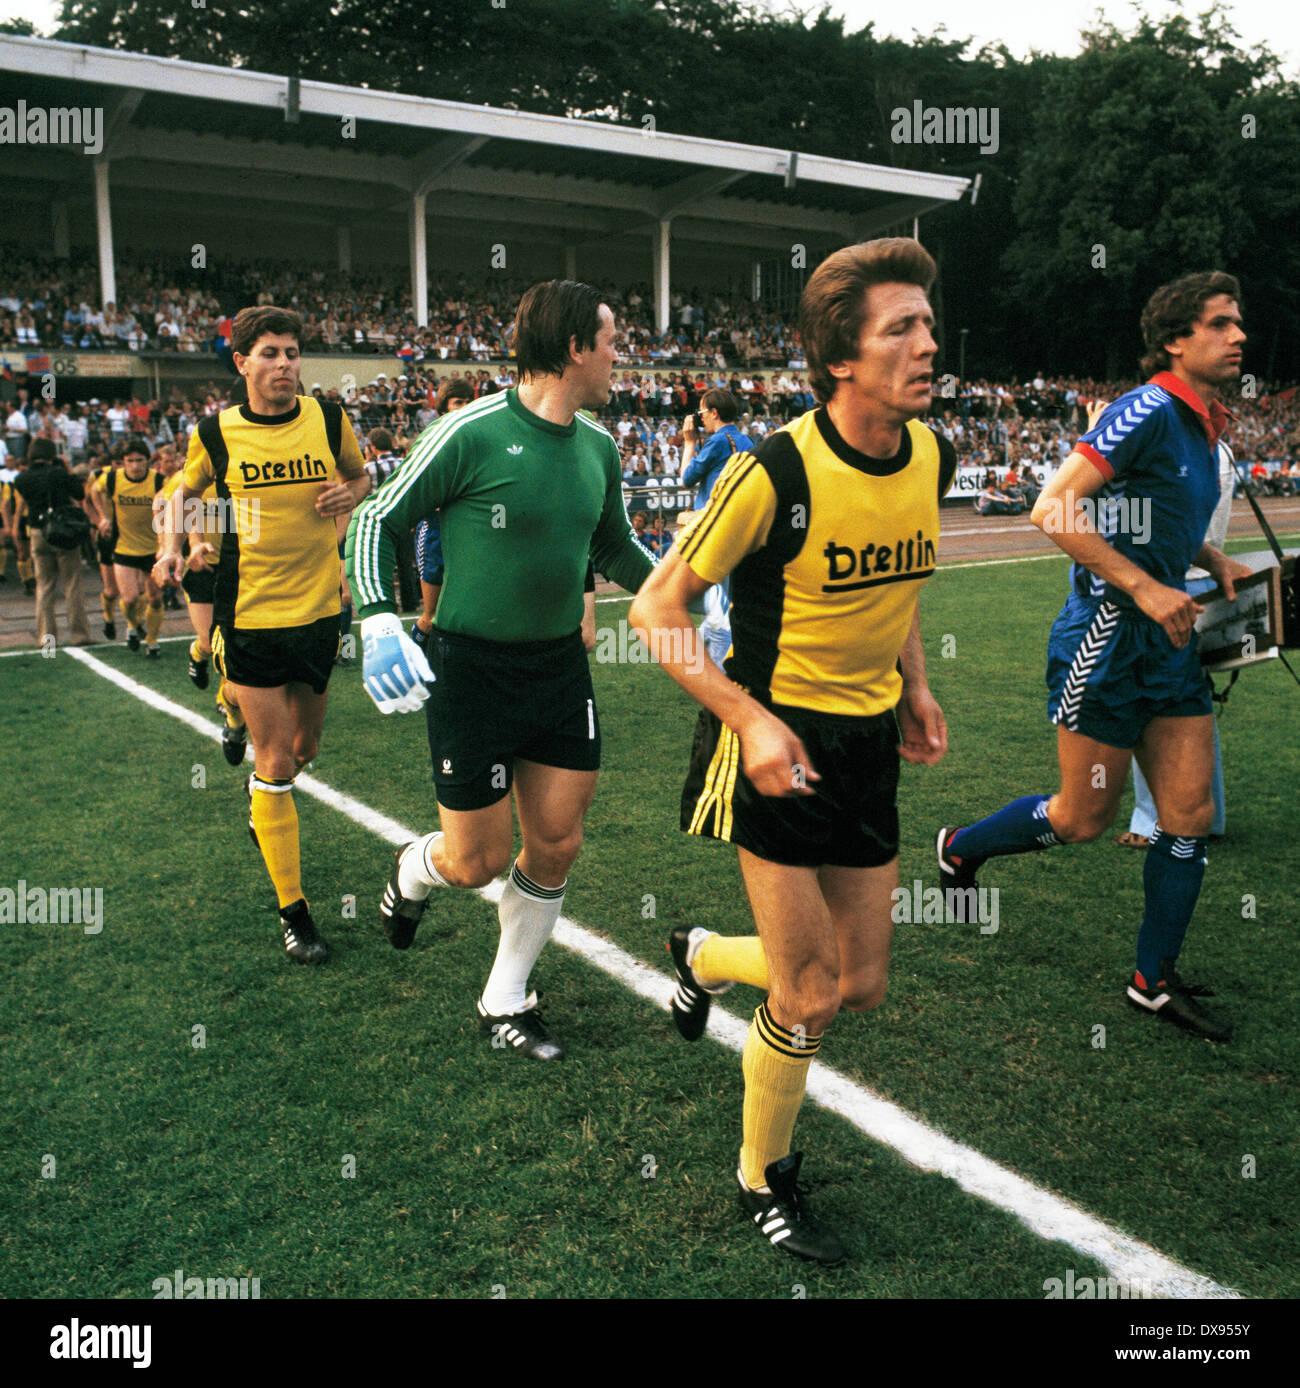 football, 2. Bundesliga Nord, 2. Bundesliga Sued, 1978/1979, relegation match to Bundesliga 1979/1980, return leg, Grotenburg Stadium in Krefeld, FC Bayer 05 Uerdingen versus SpVgg Bayreuth 2:1, running-in of the teams, f.l.t.r. Rolf Kaul (Bayreuth), keep - Stock Image